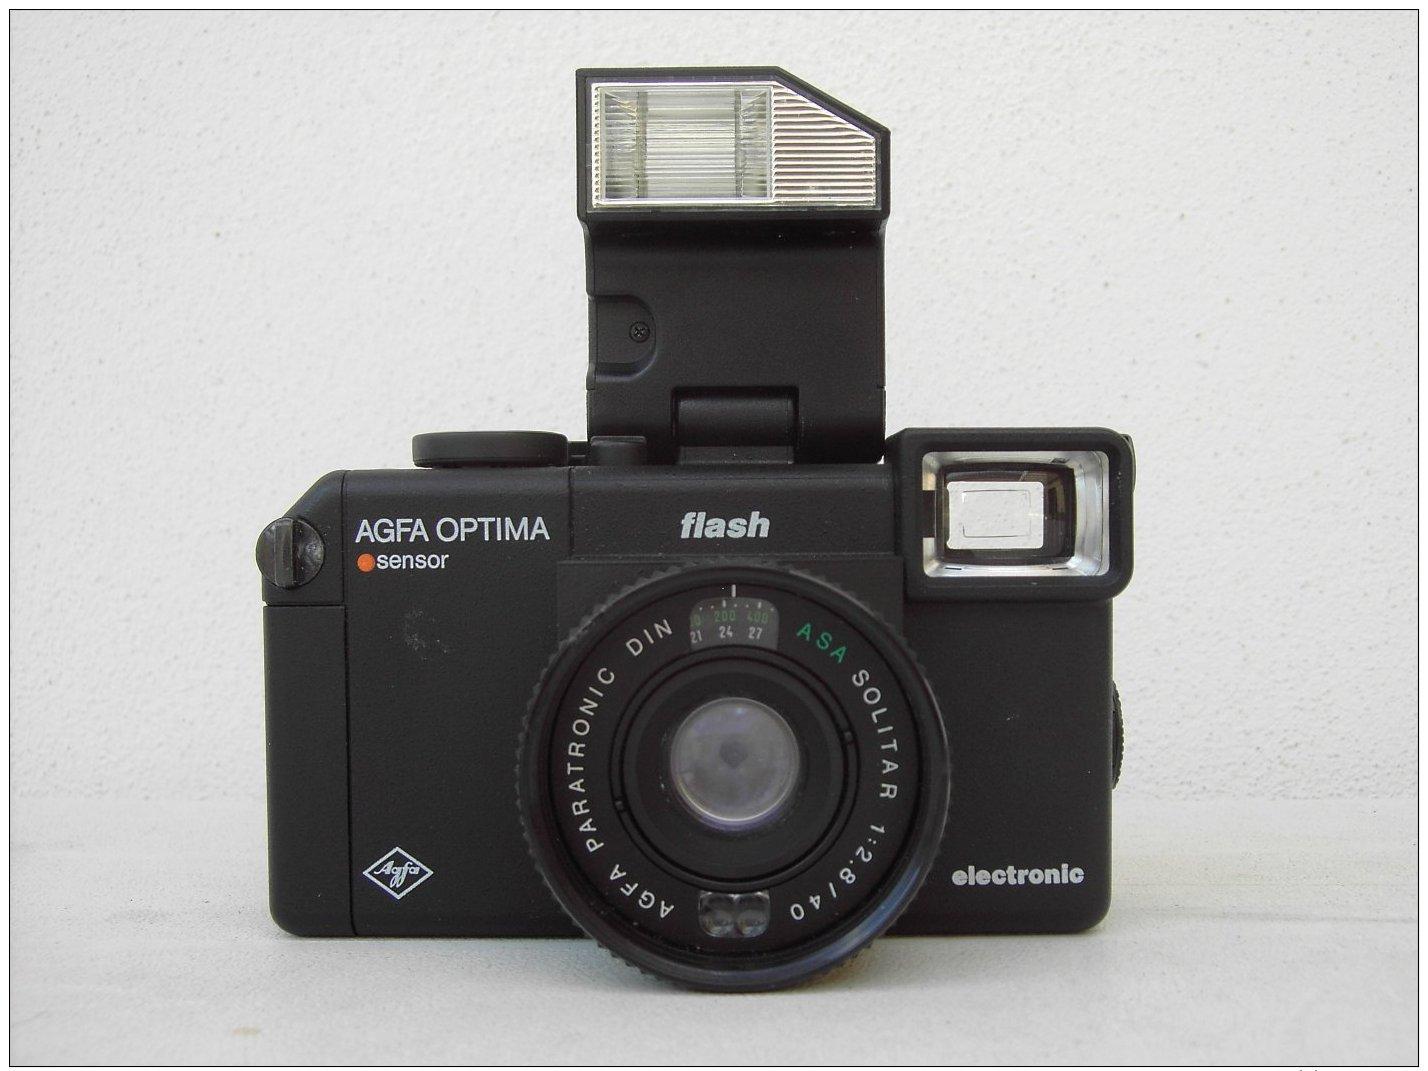 AGFA OPTIMA FLASH SENSOR - Cameras